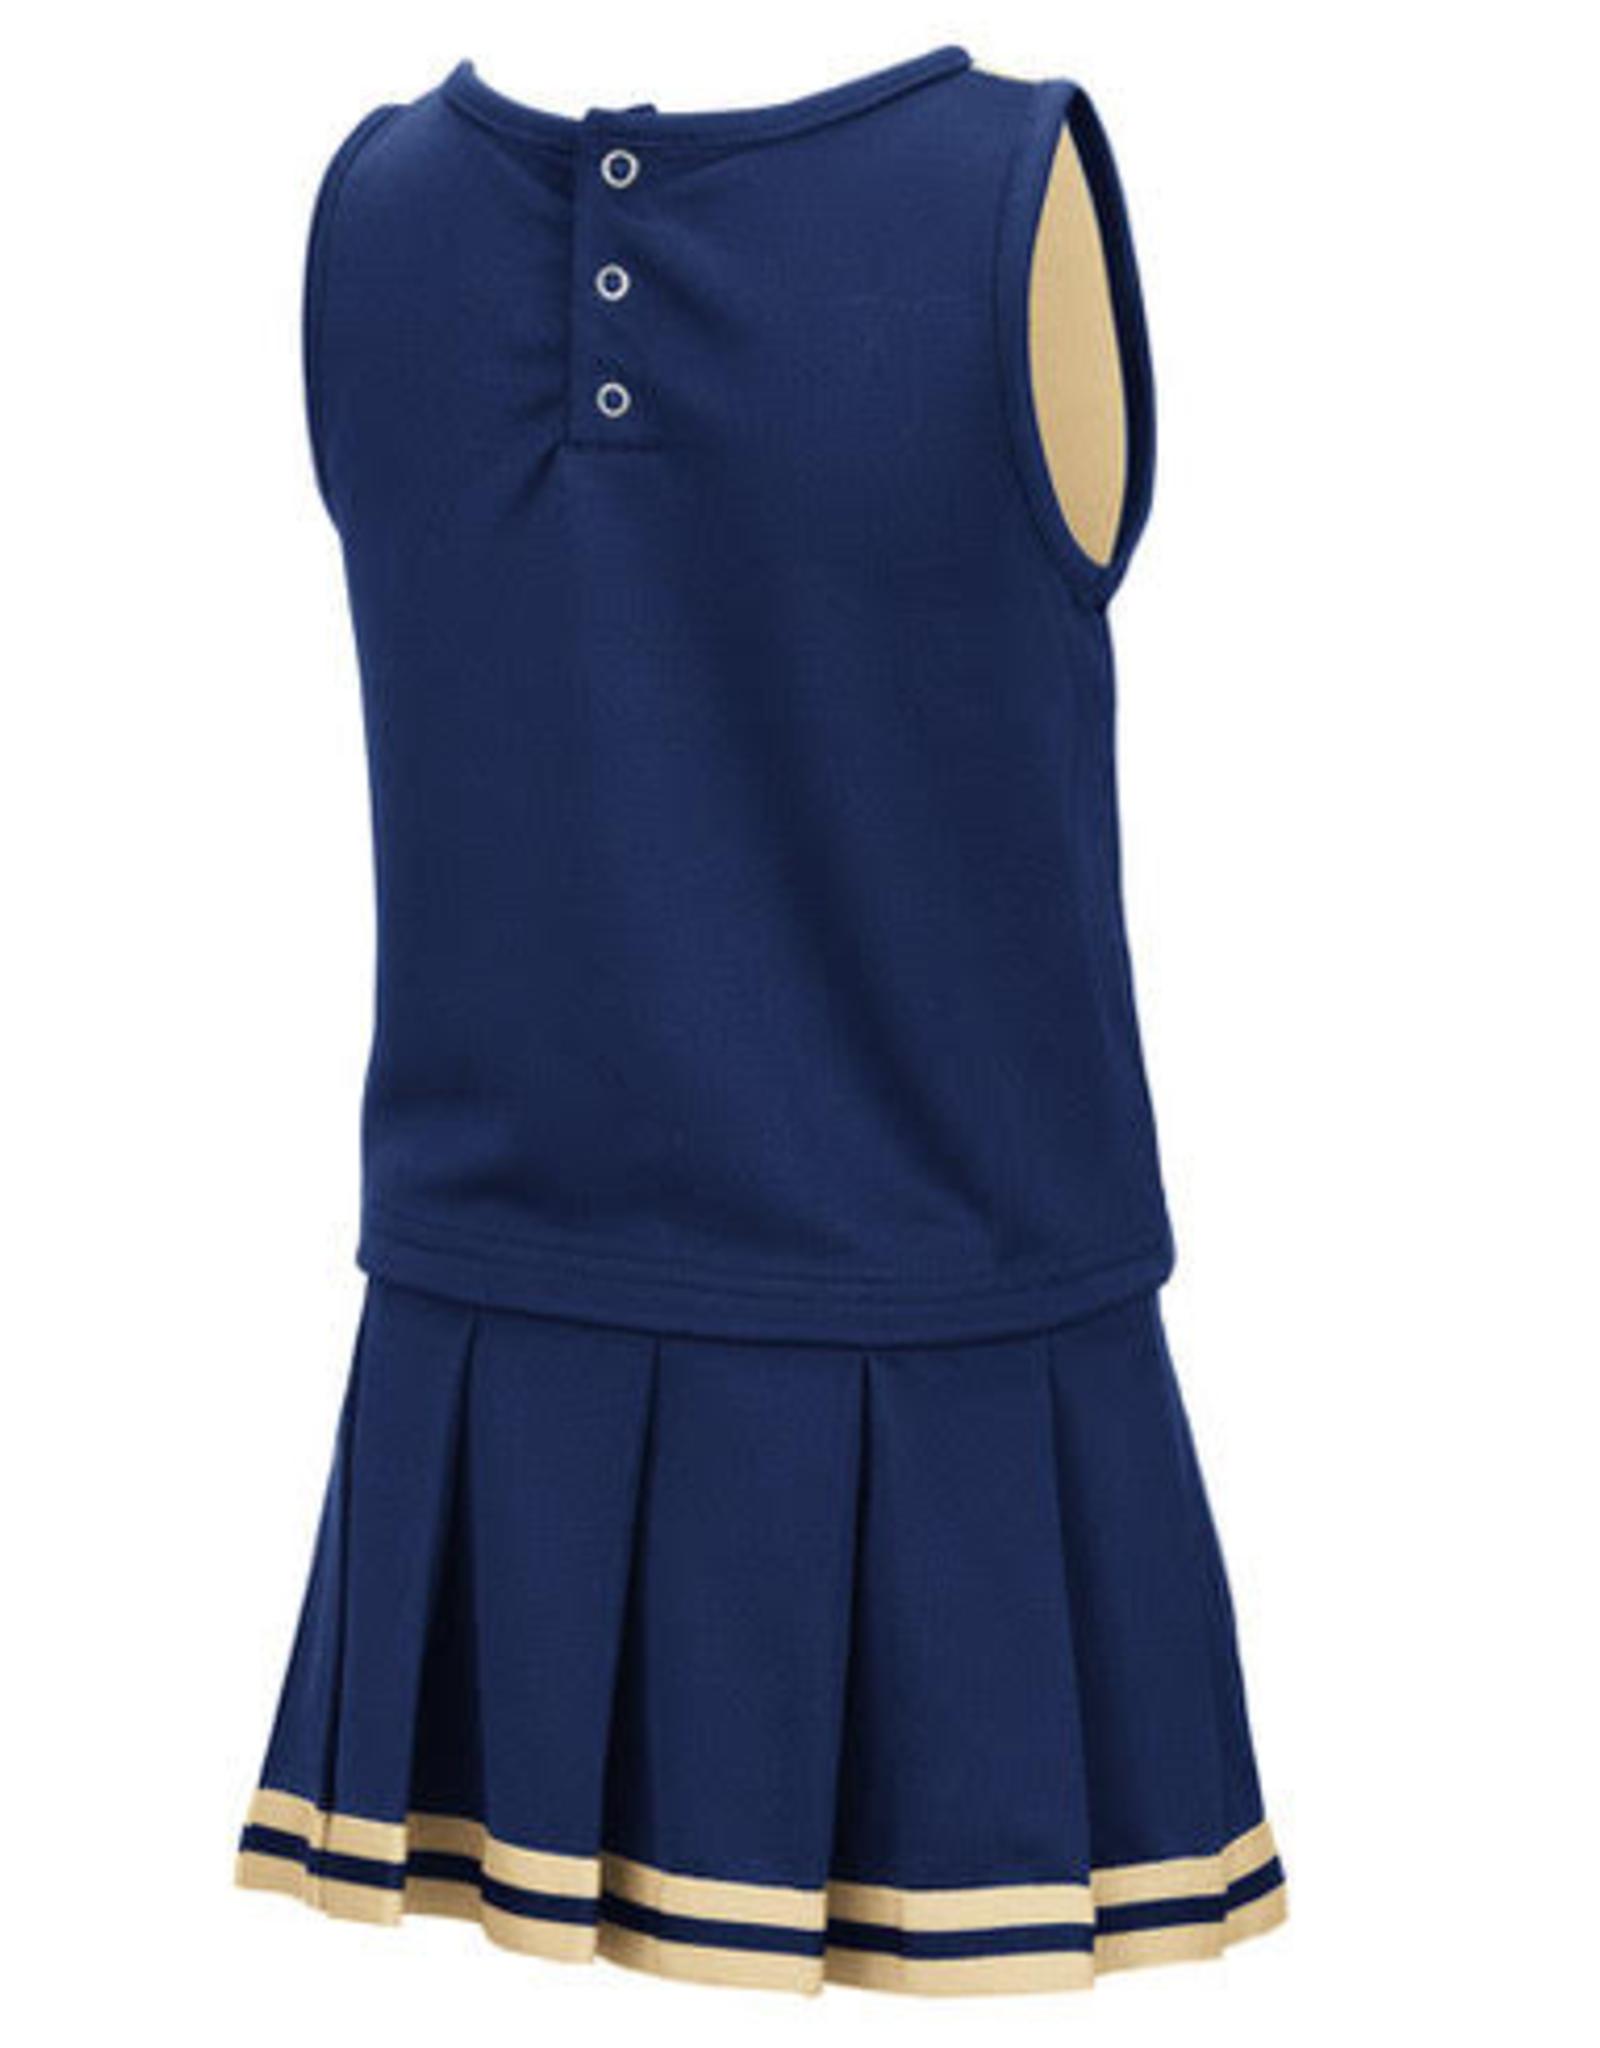 Colosseum Toddler Cheer 2PC Dress